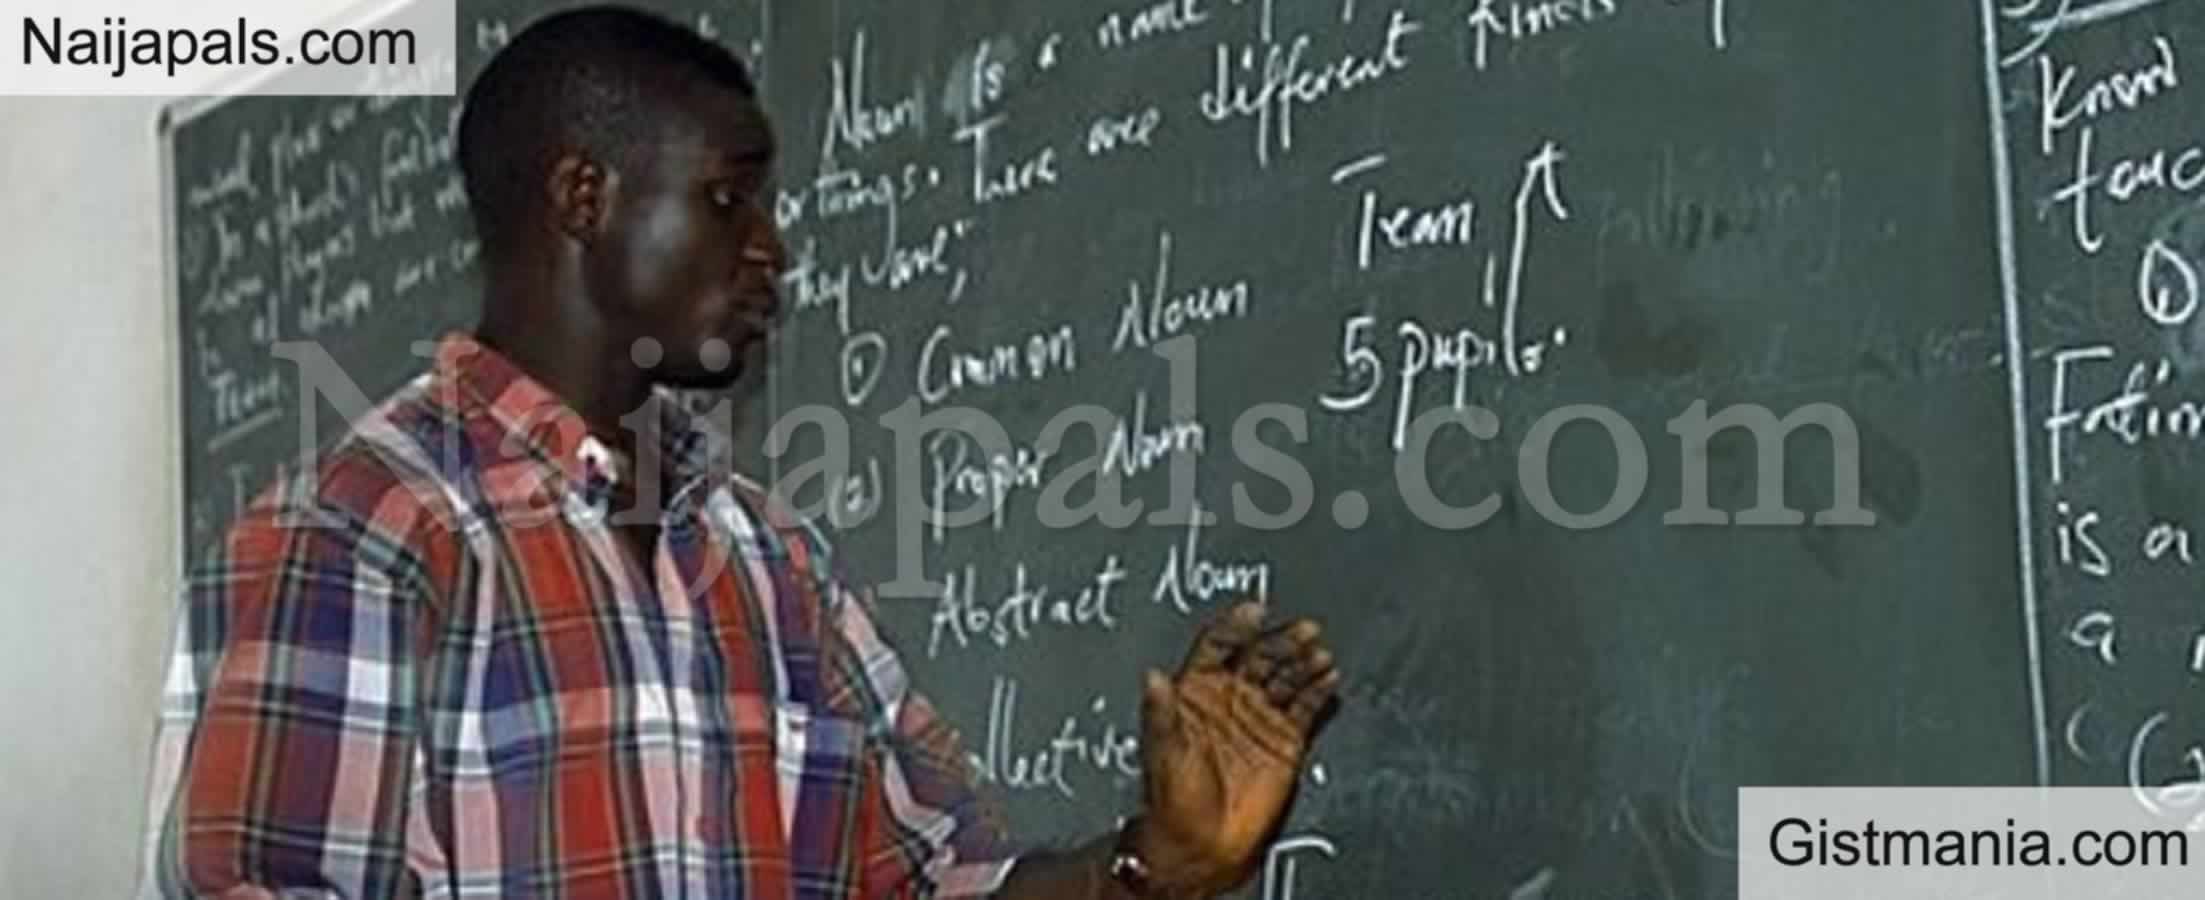 <img alt='.' class='lazyload' data-src='https://img.gistmania.com/emot/news.gif' /> GOOD NEWS: <b>Oyo Govt Reportedly Promotes 16,500 Primary School Teachers </b>